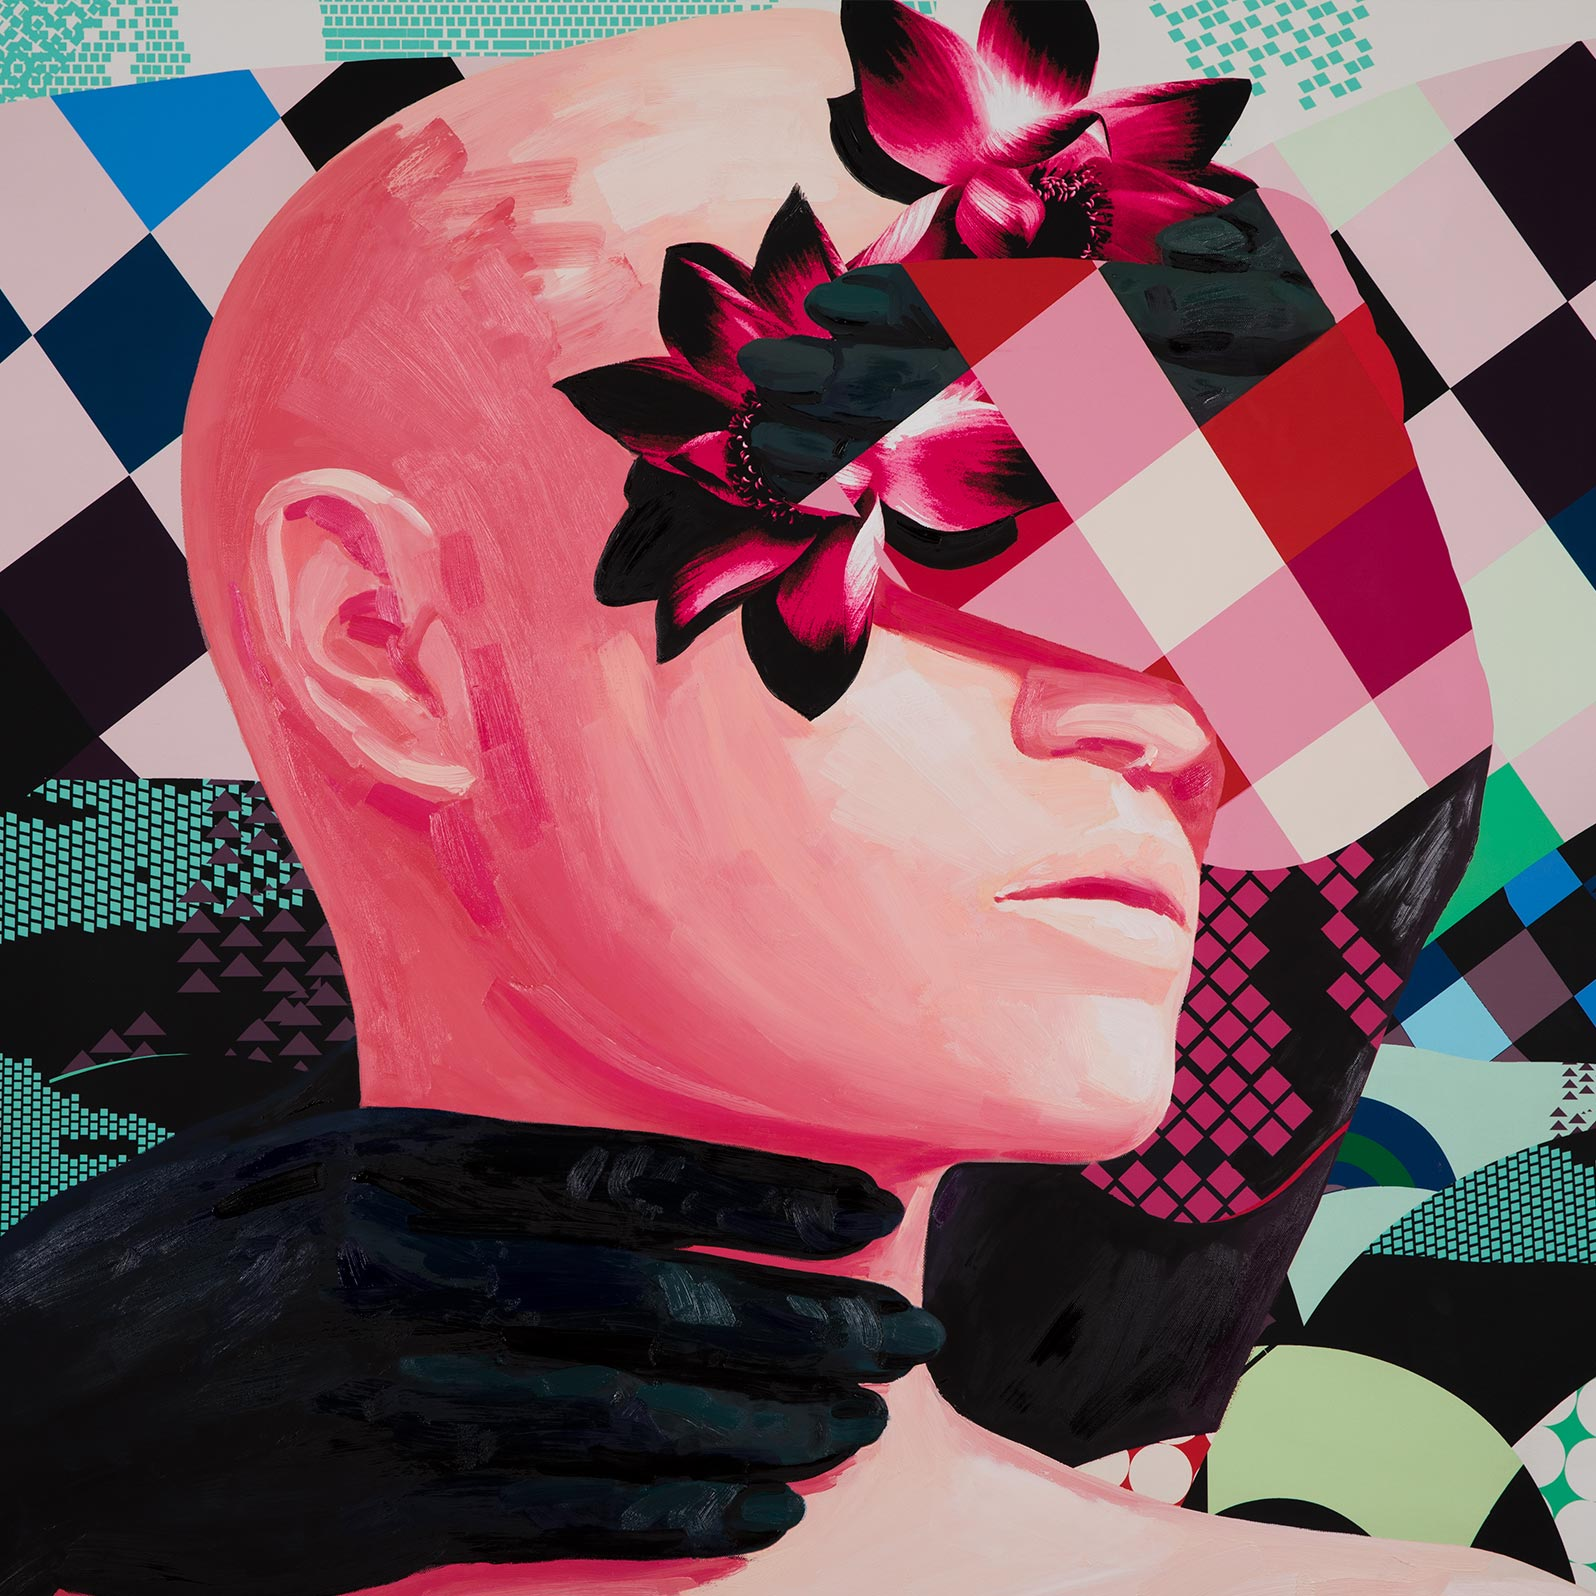 Anca Stefanescu | Contemporary Creative Painter, OpeningToChannel